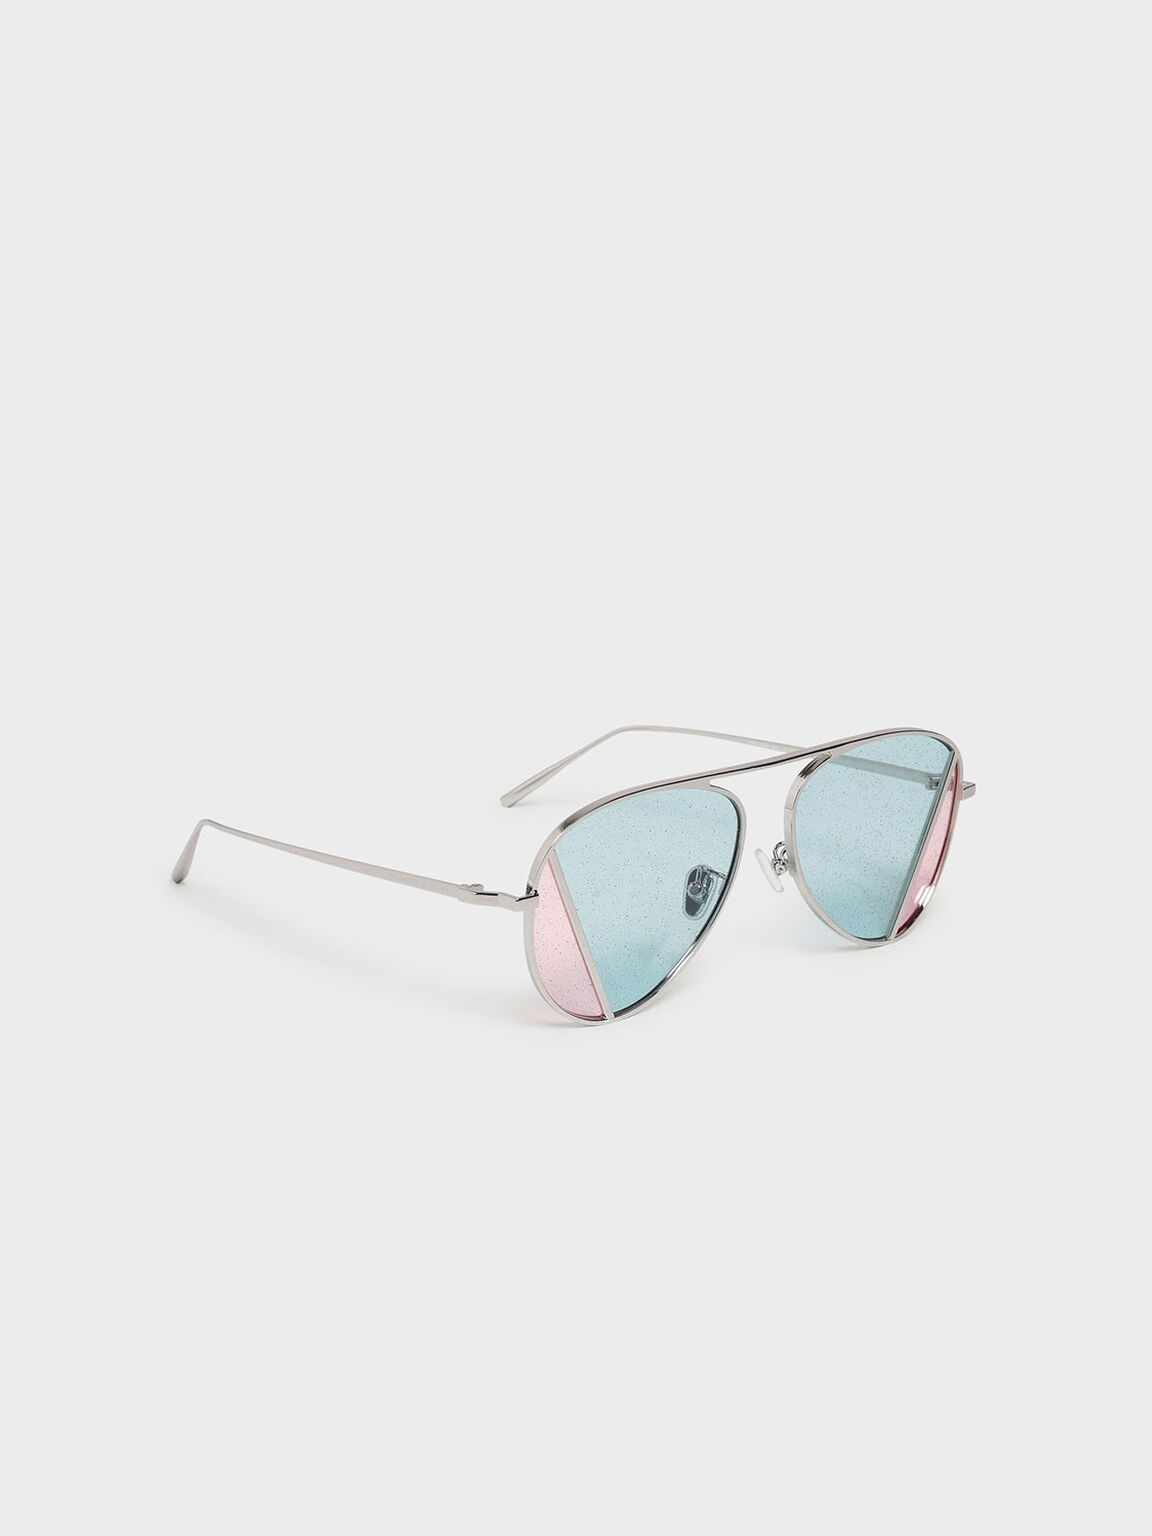 Two-Tone Aviator Sunglasses, Multi, hi-res